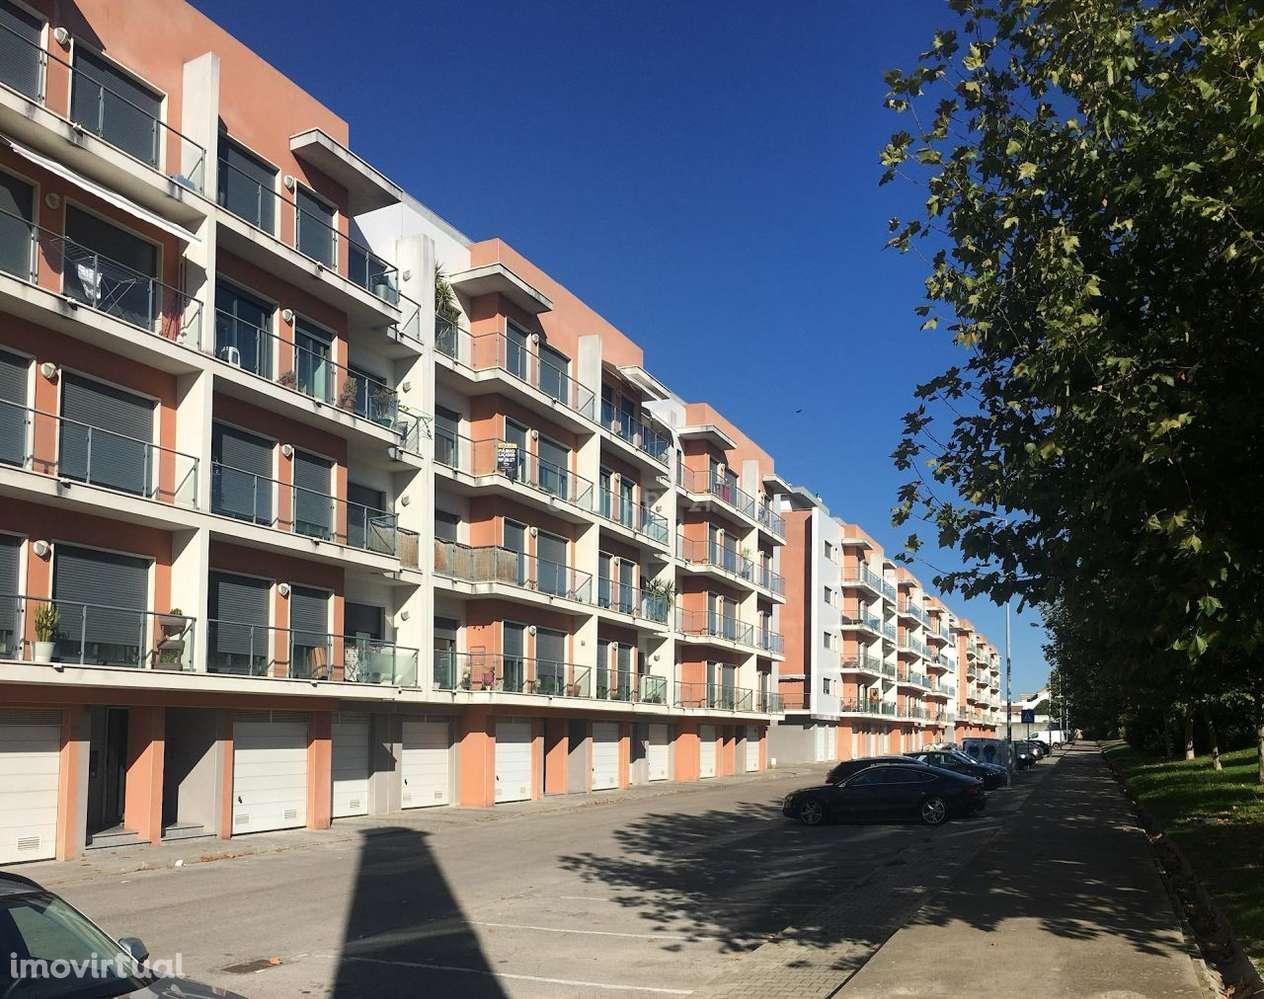 Apartamento para comprar, Montijo e Afonsoeiro, Montijo, Setúbal - Foto 1